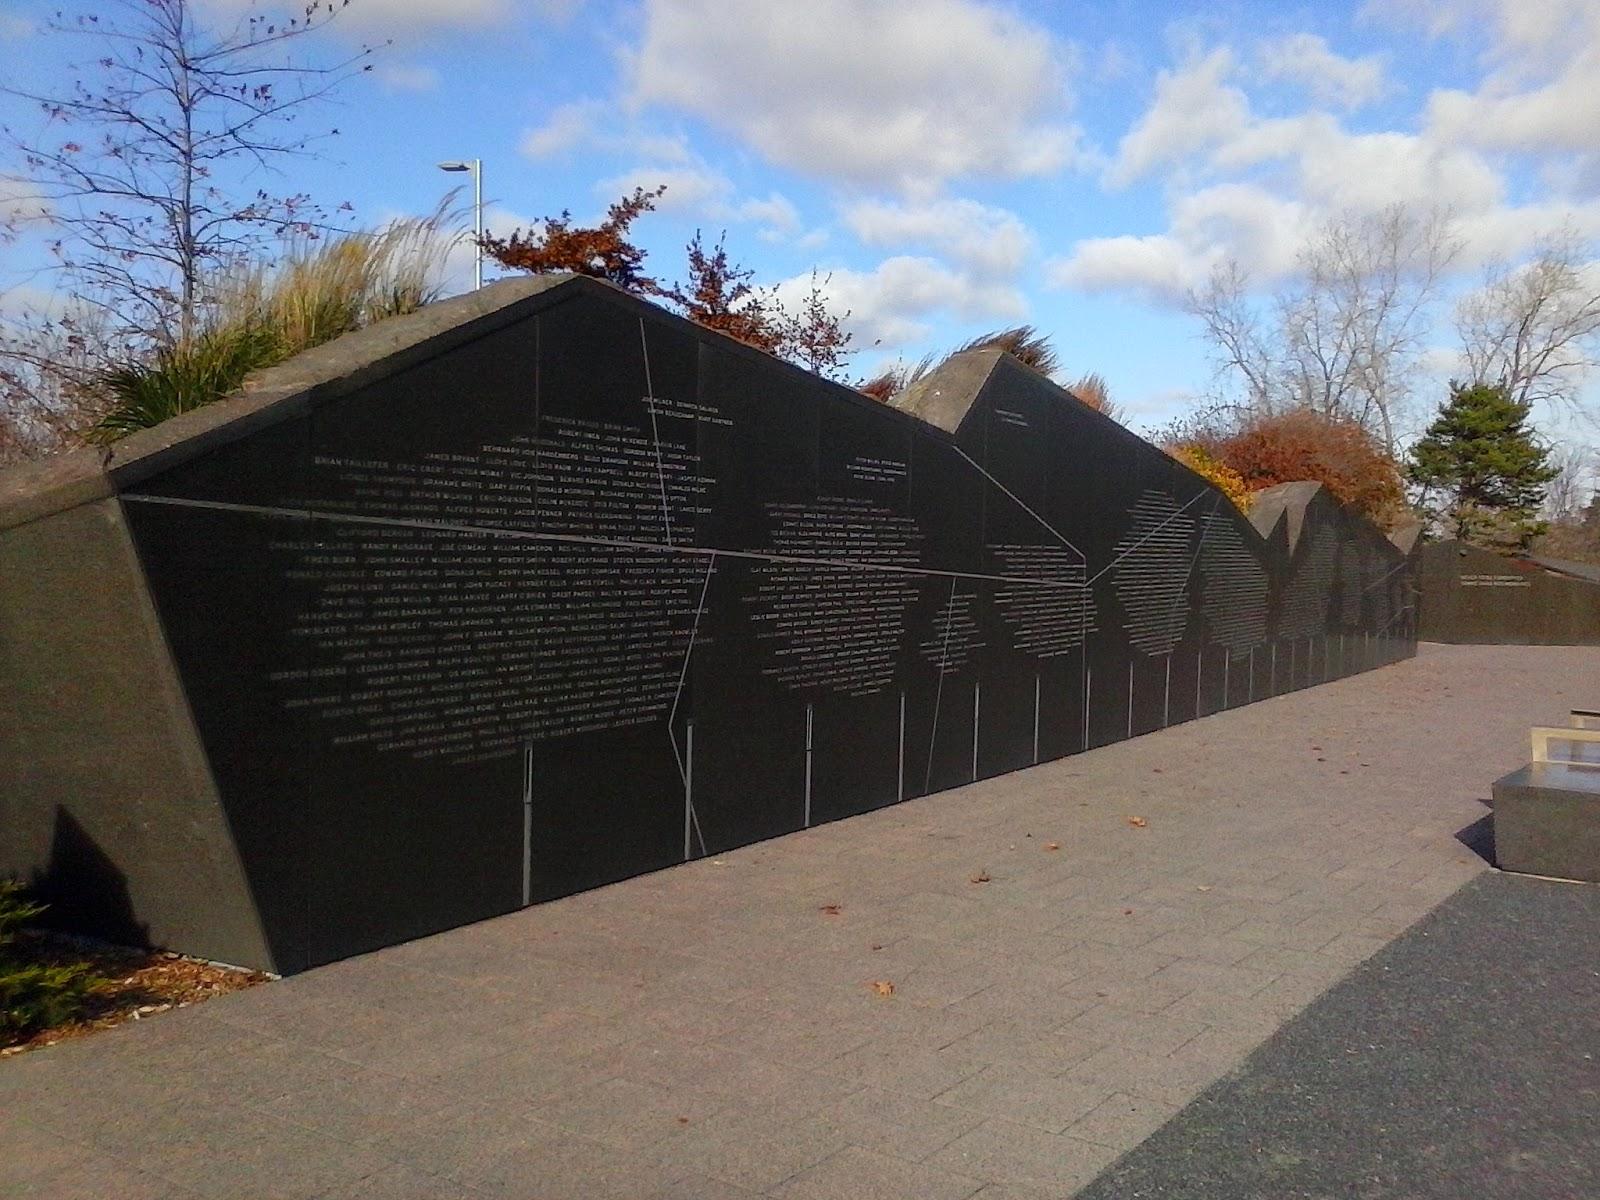 Ottawa Daily Photo: Memorial Vantages